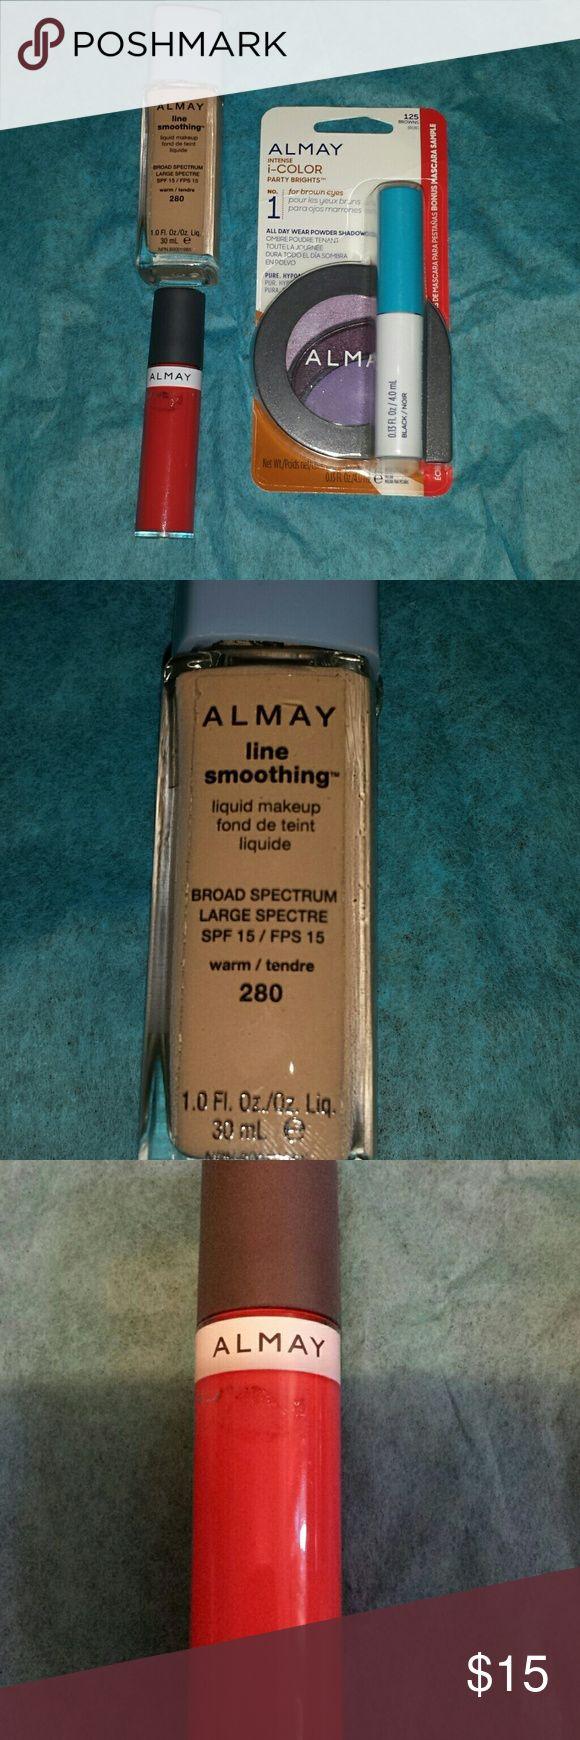 NEW Almay makeup bundle Brands new never opened Almay